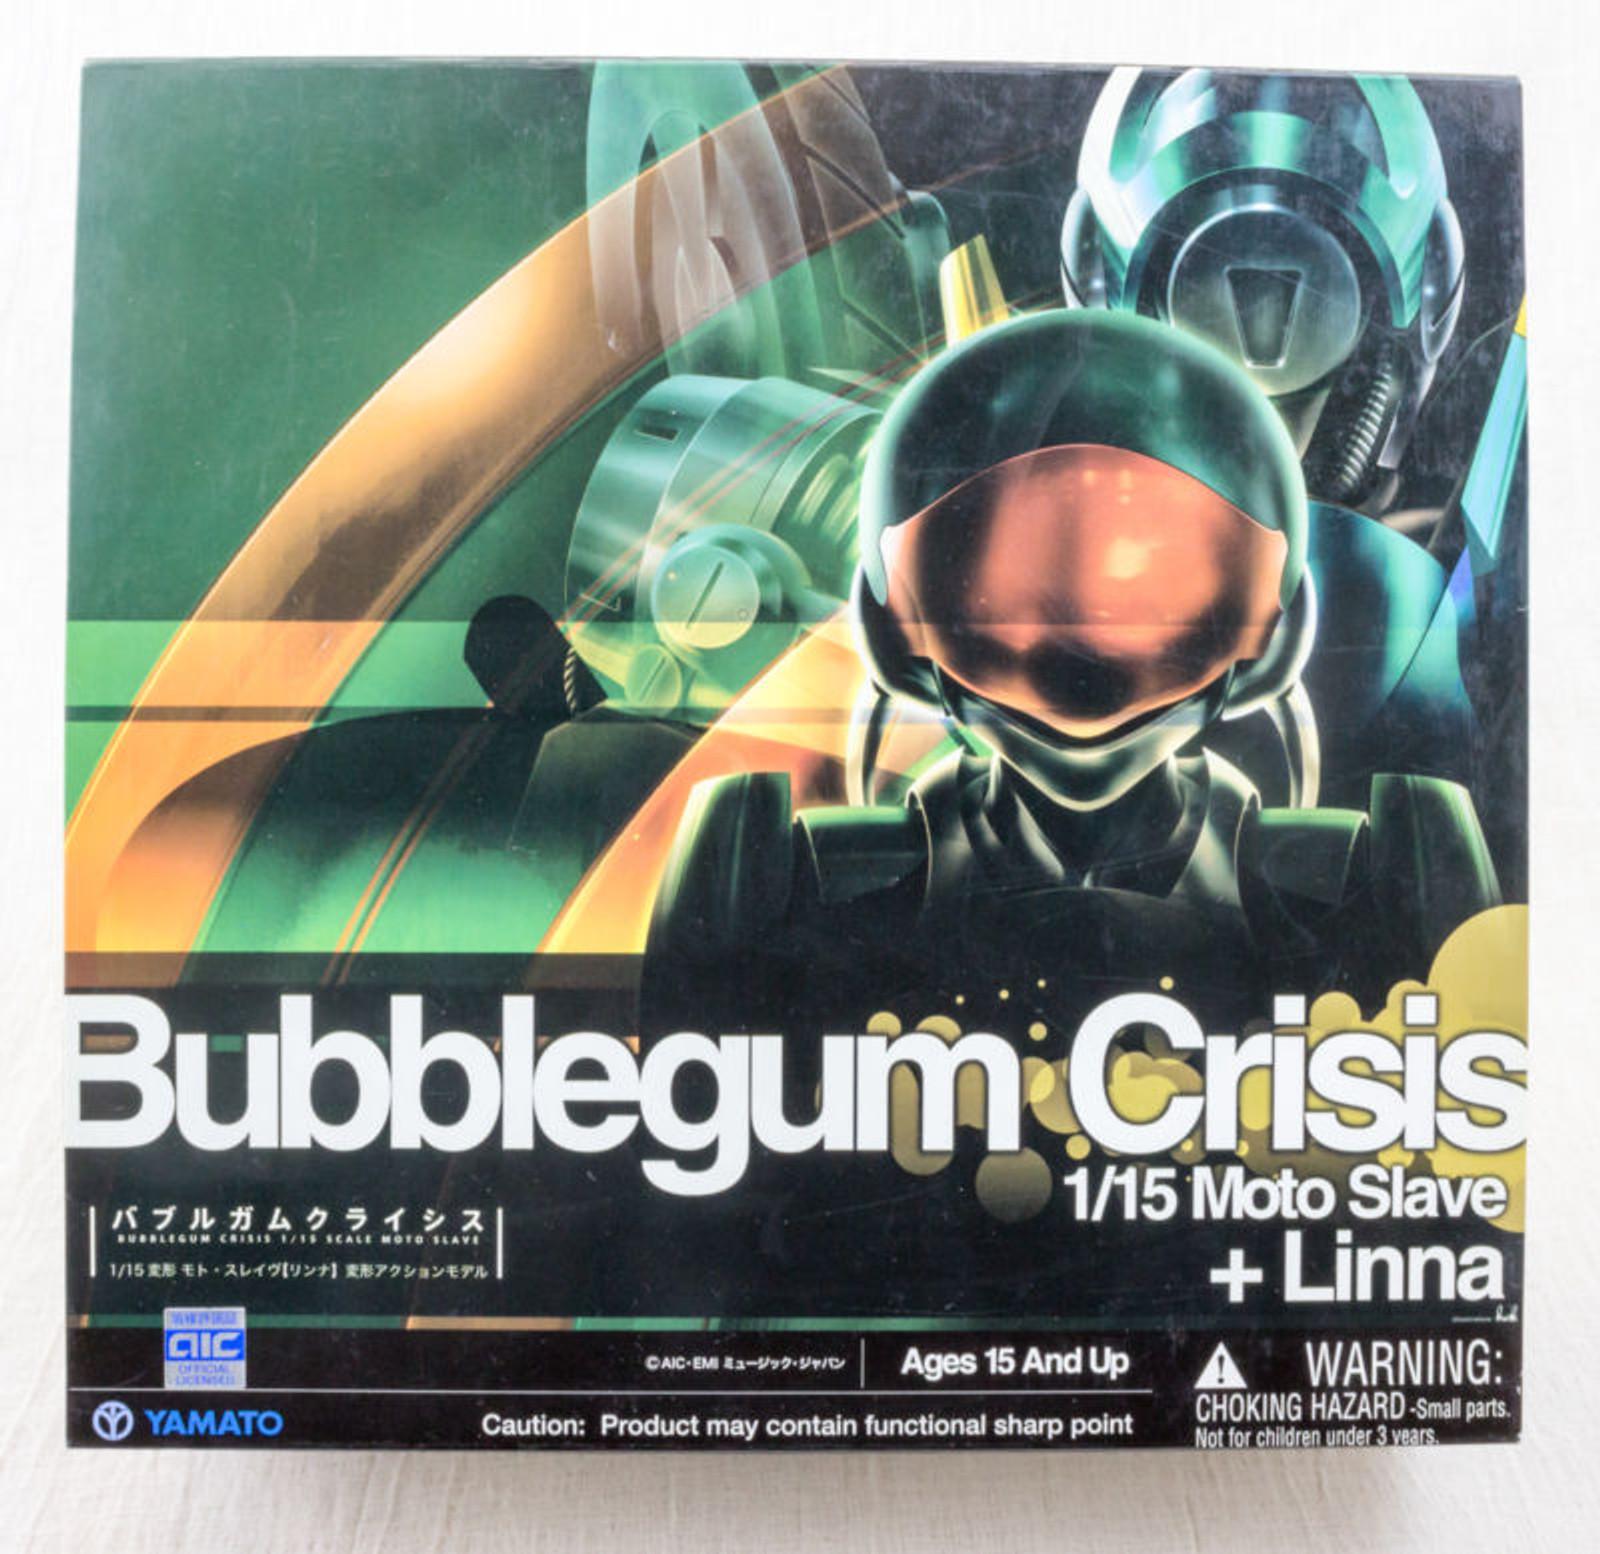 Bubblegum Crisis Linna 1/15 Scale Moto Slave Figure Yamato JAPAN ANIME MANGA